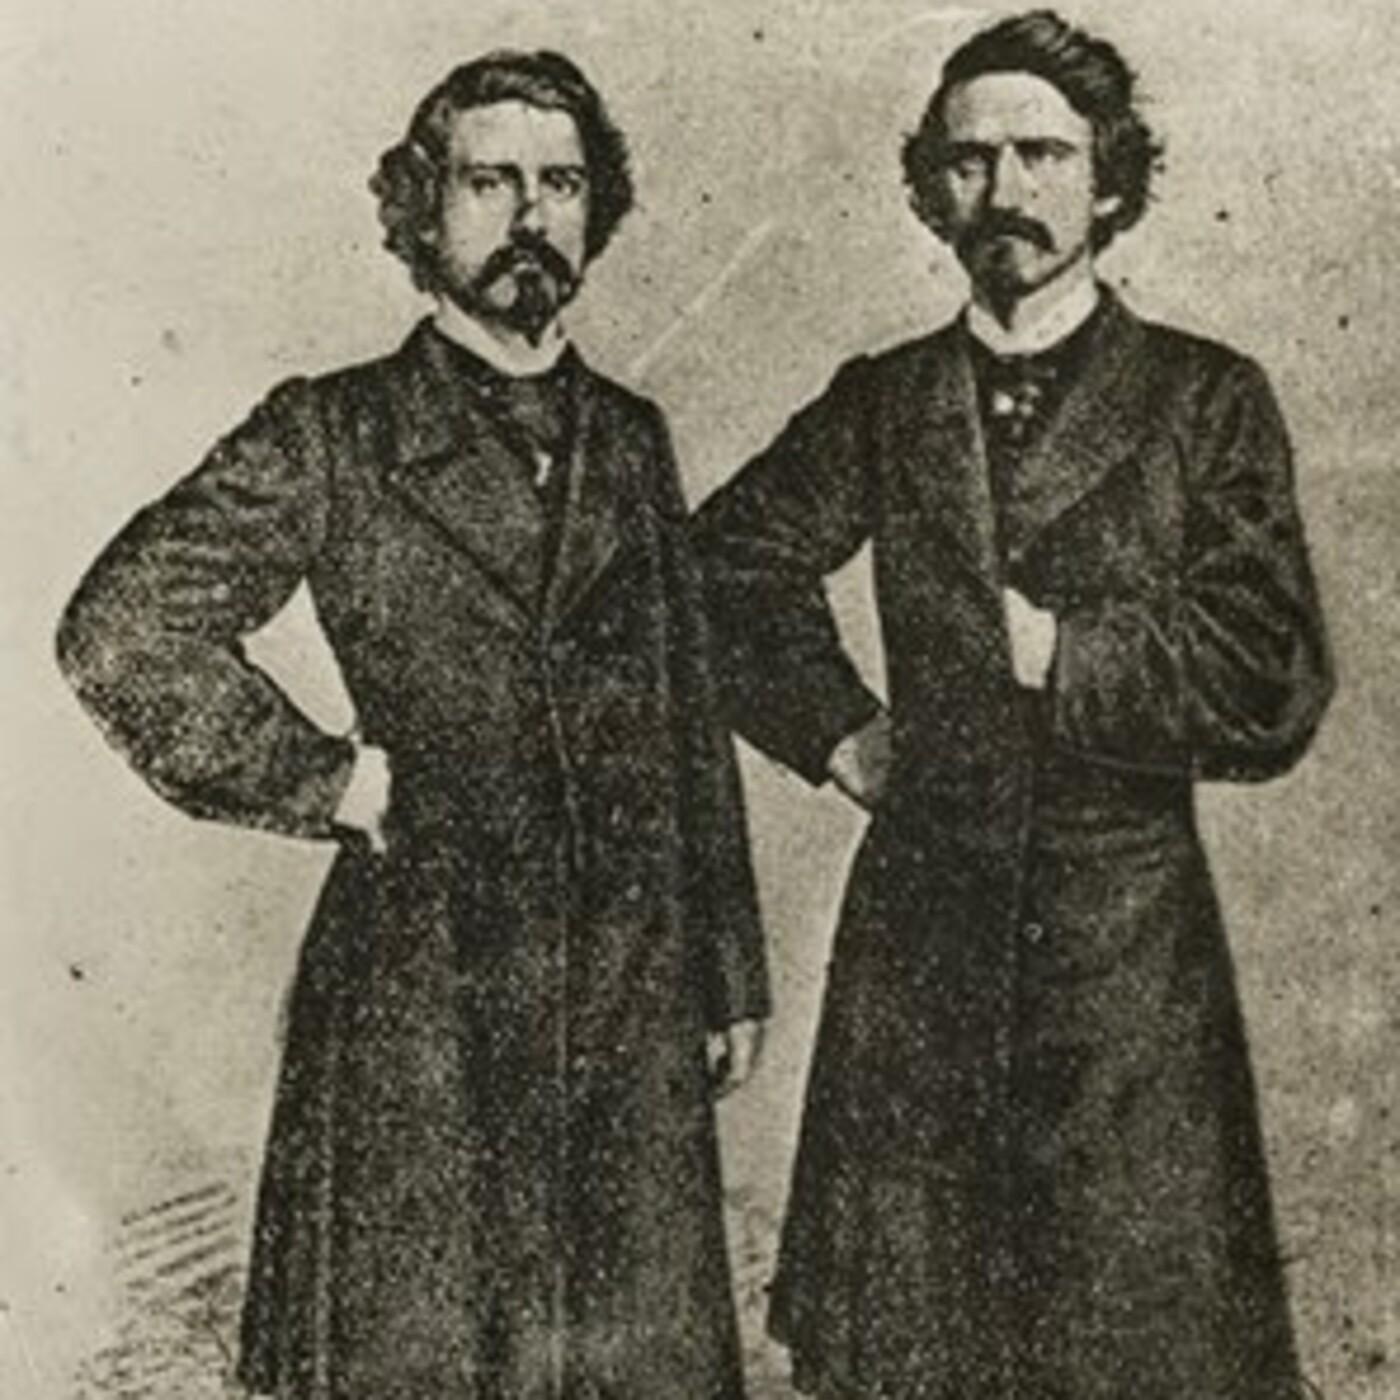 Misterios en Viernes nº293: Gips del siglo XIX